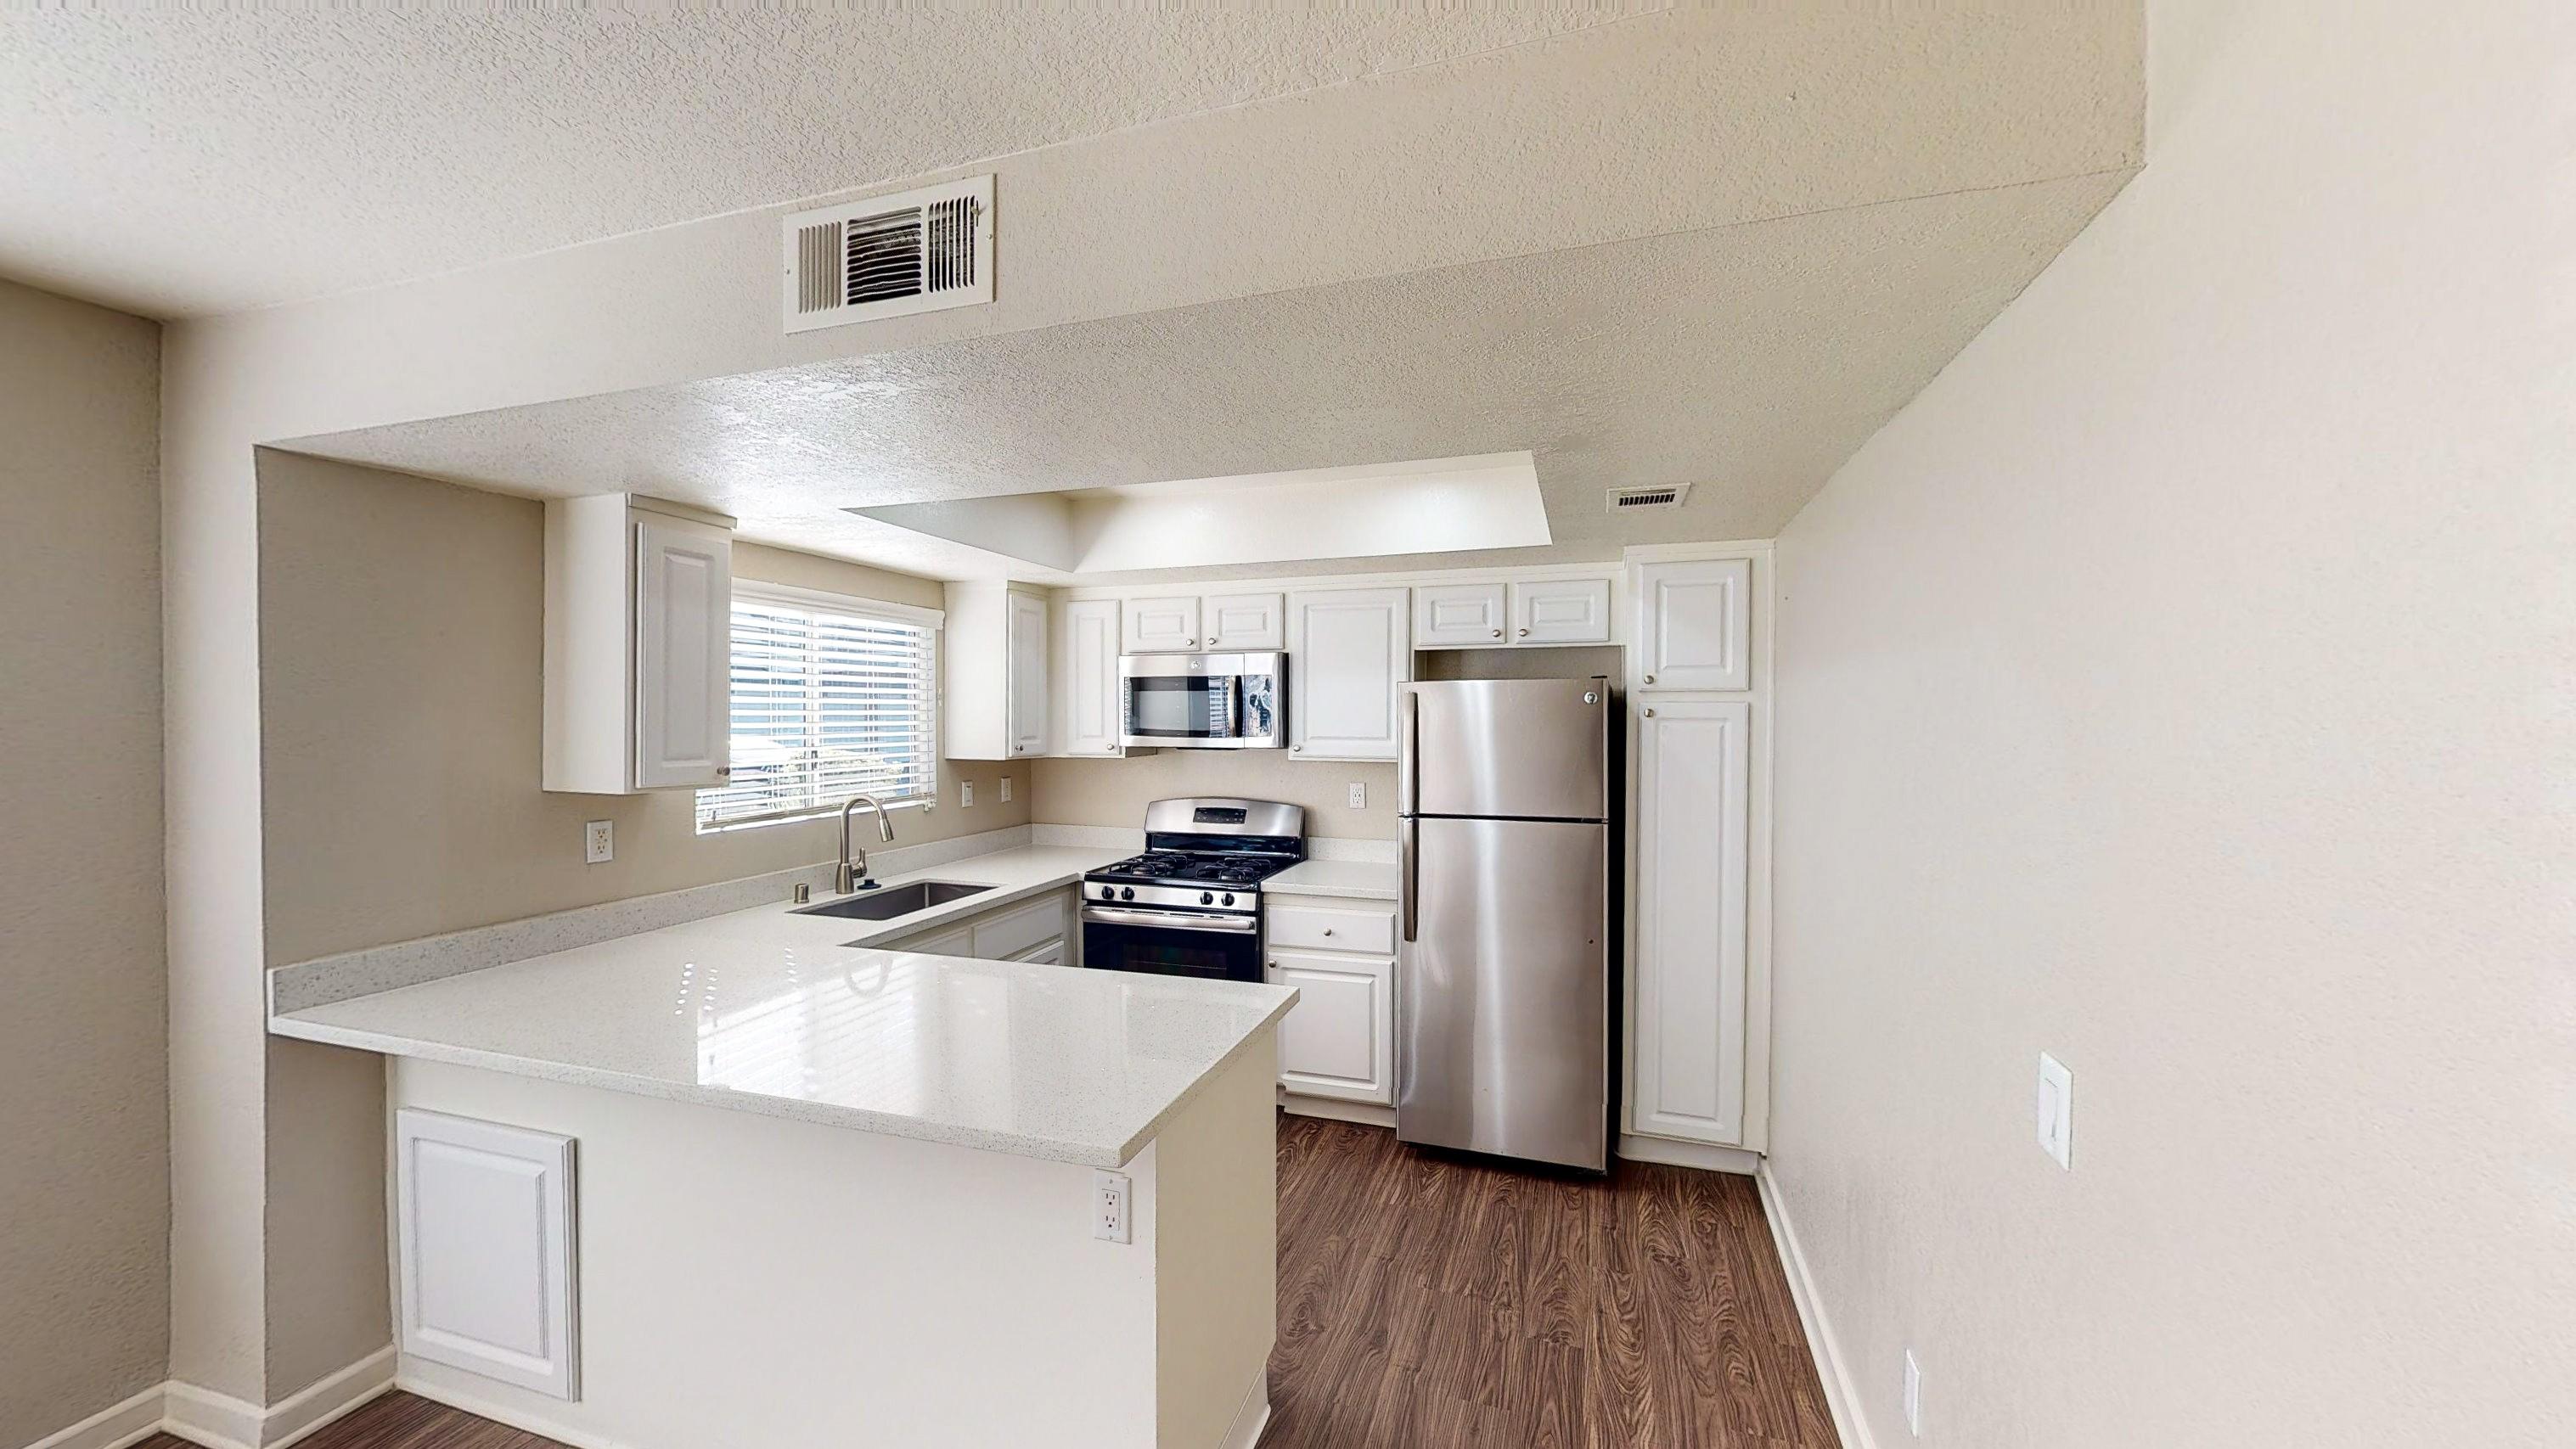 Apartments Near CCCD The Cascades for Coast Community College District Students in Coasta Mesa, CA